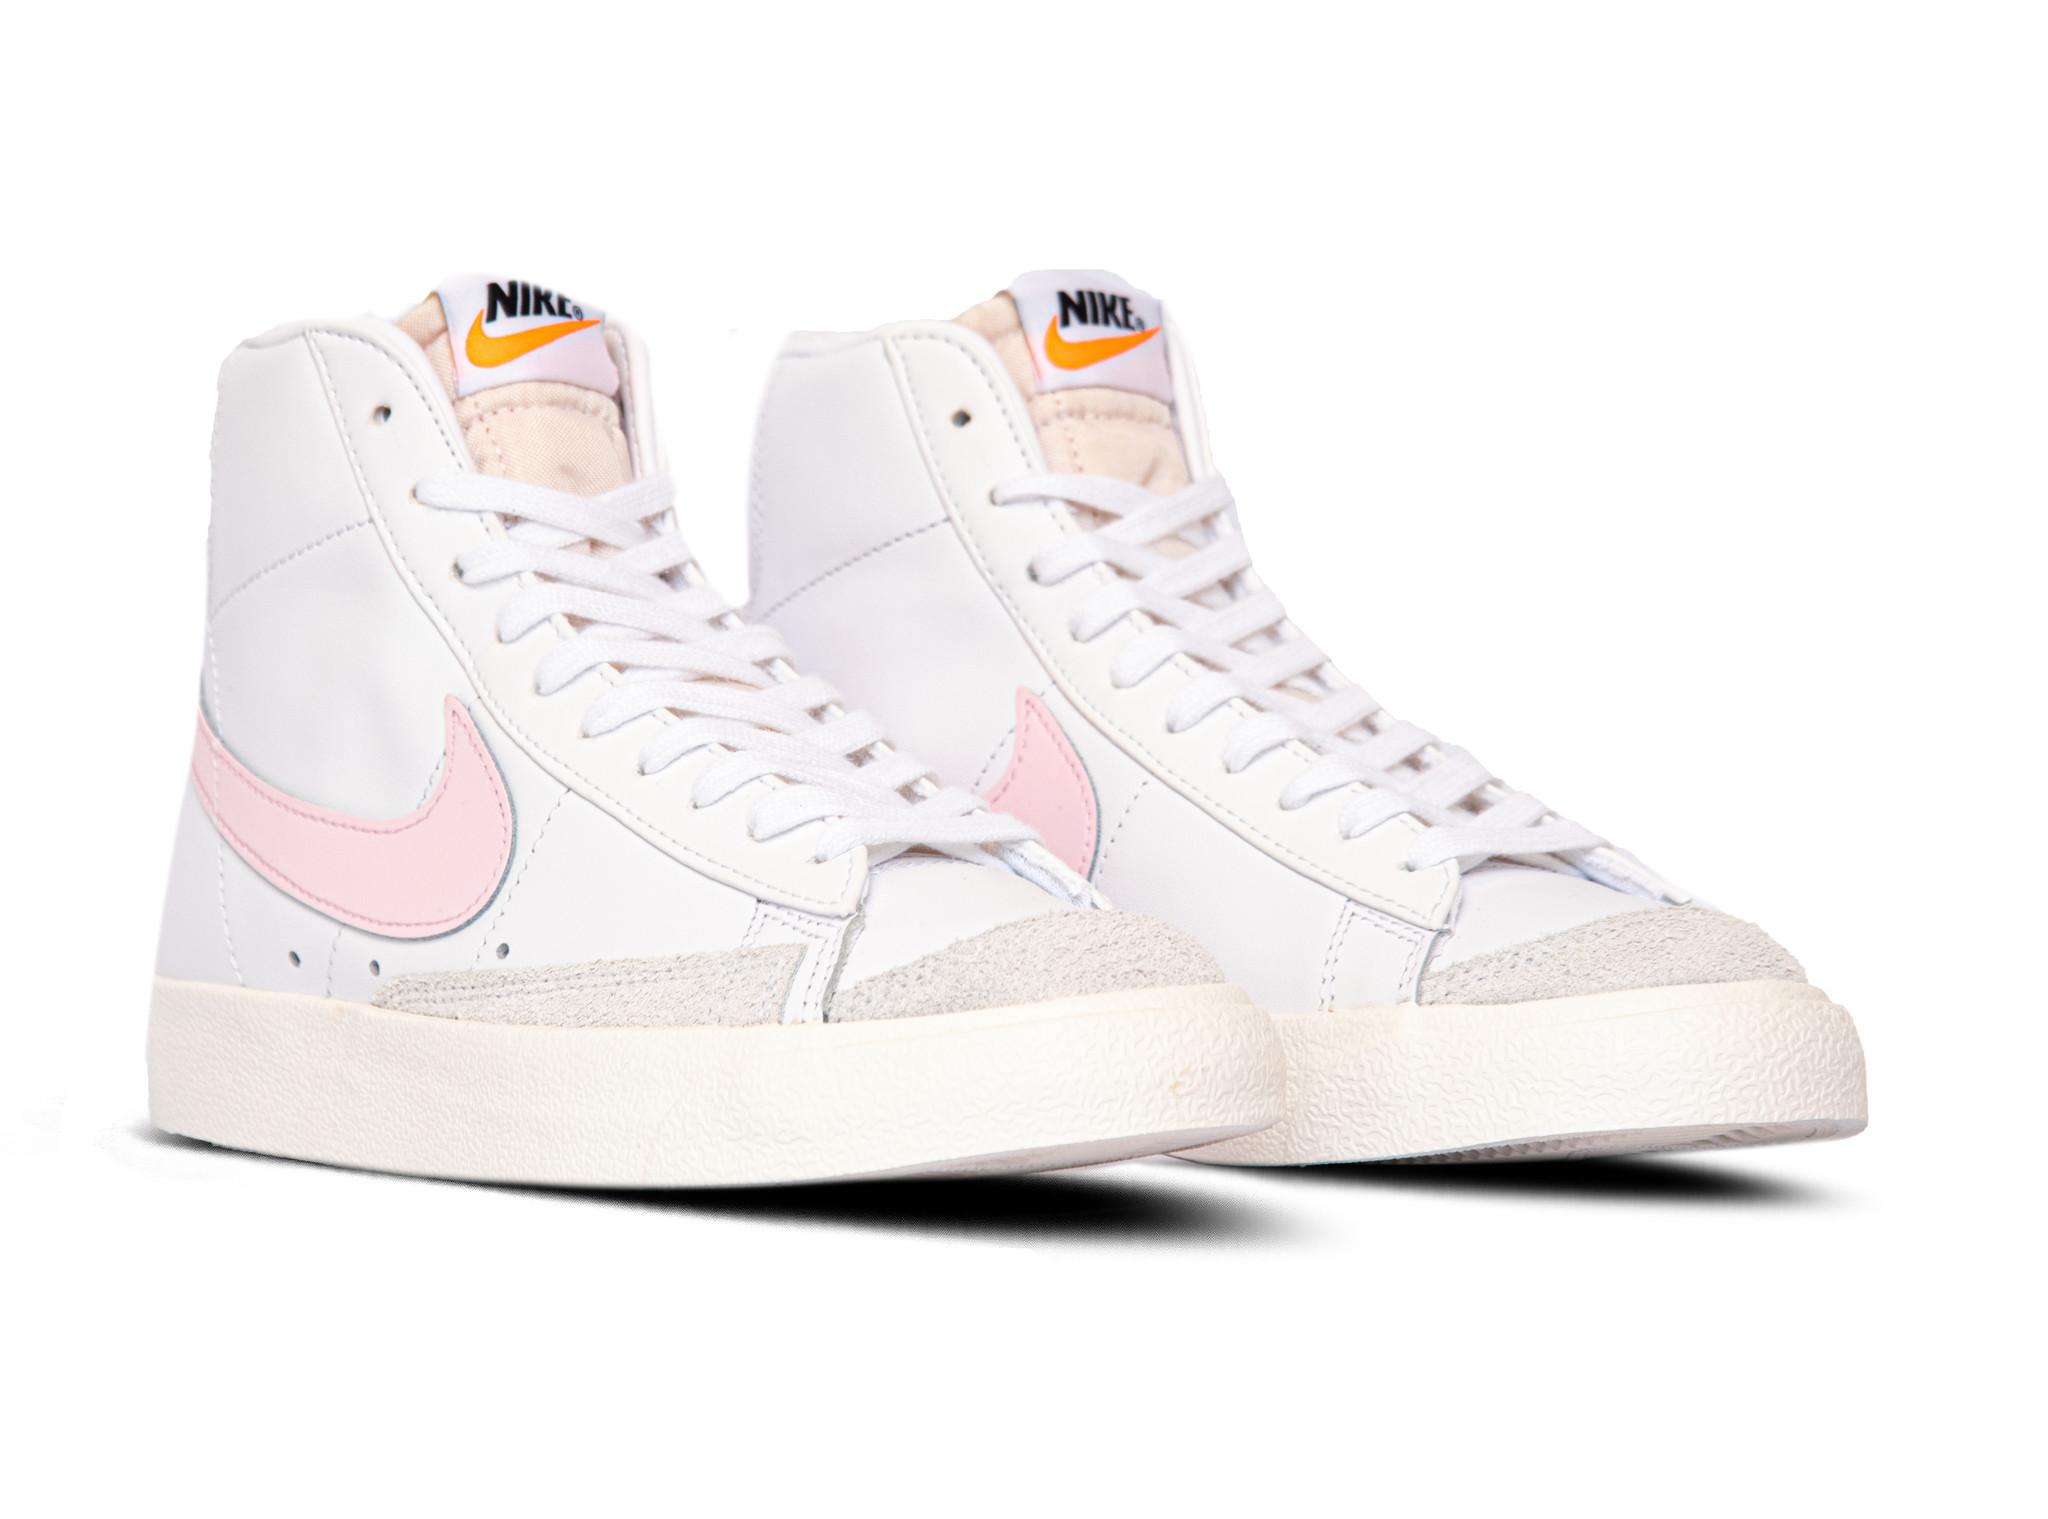 Nike Blazer Mid 77 Vintage White Pink Foam Sail BQ6806 108 | Bruut ...